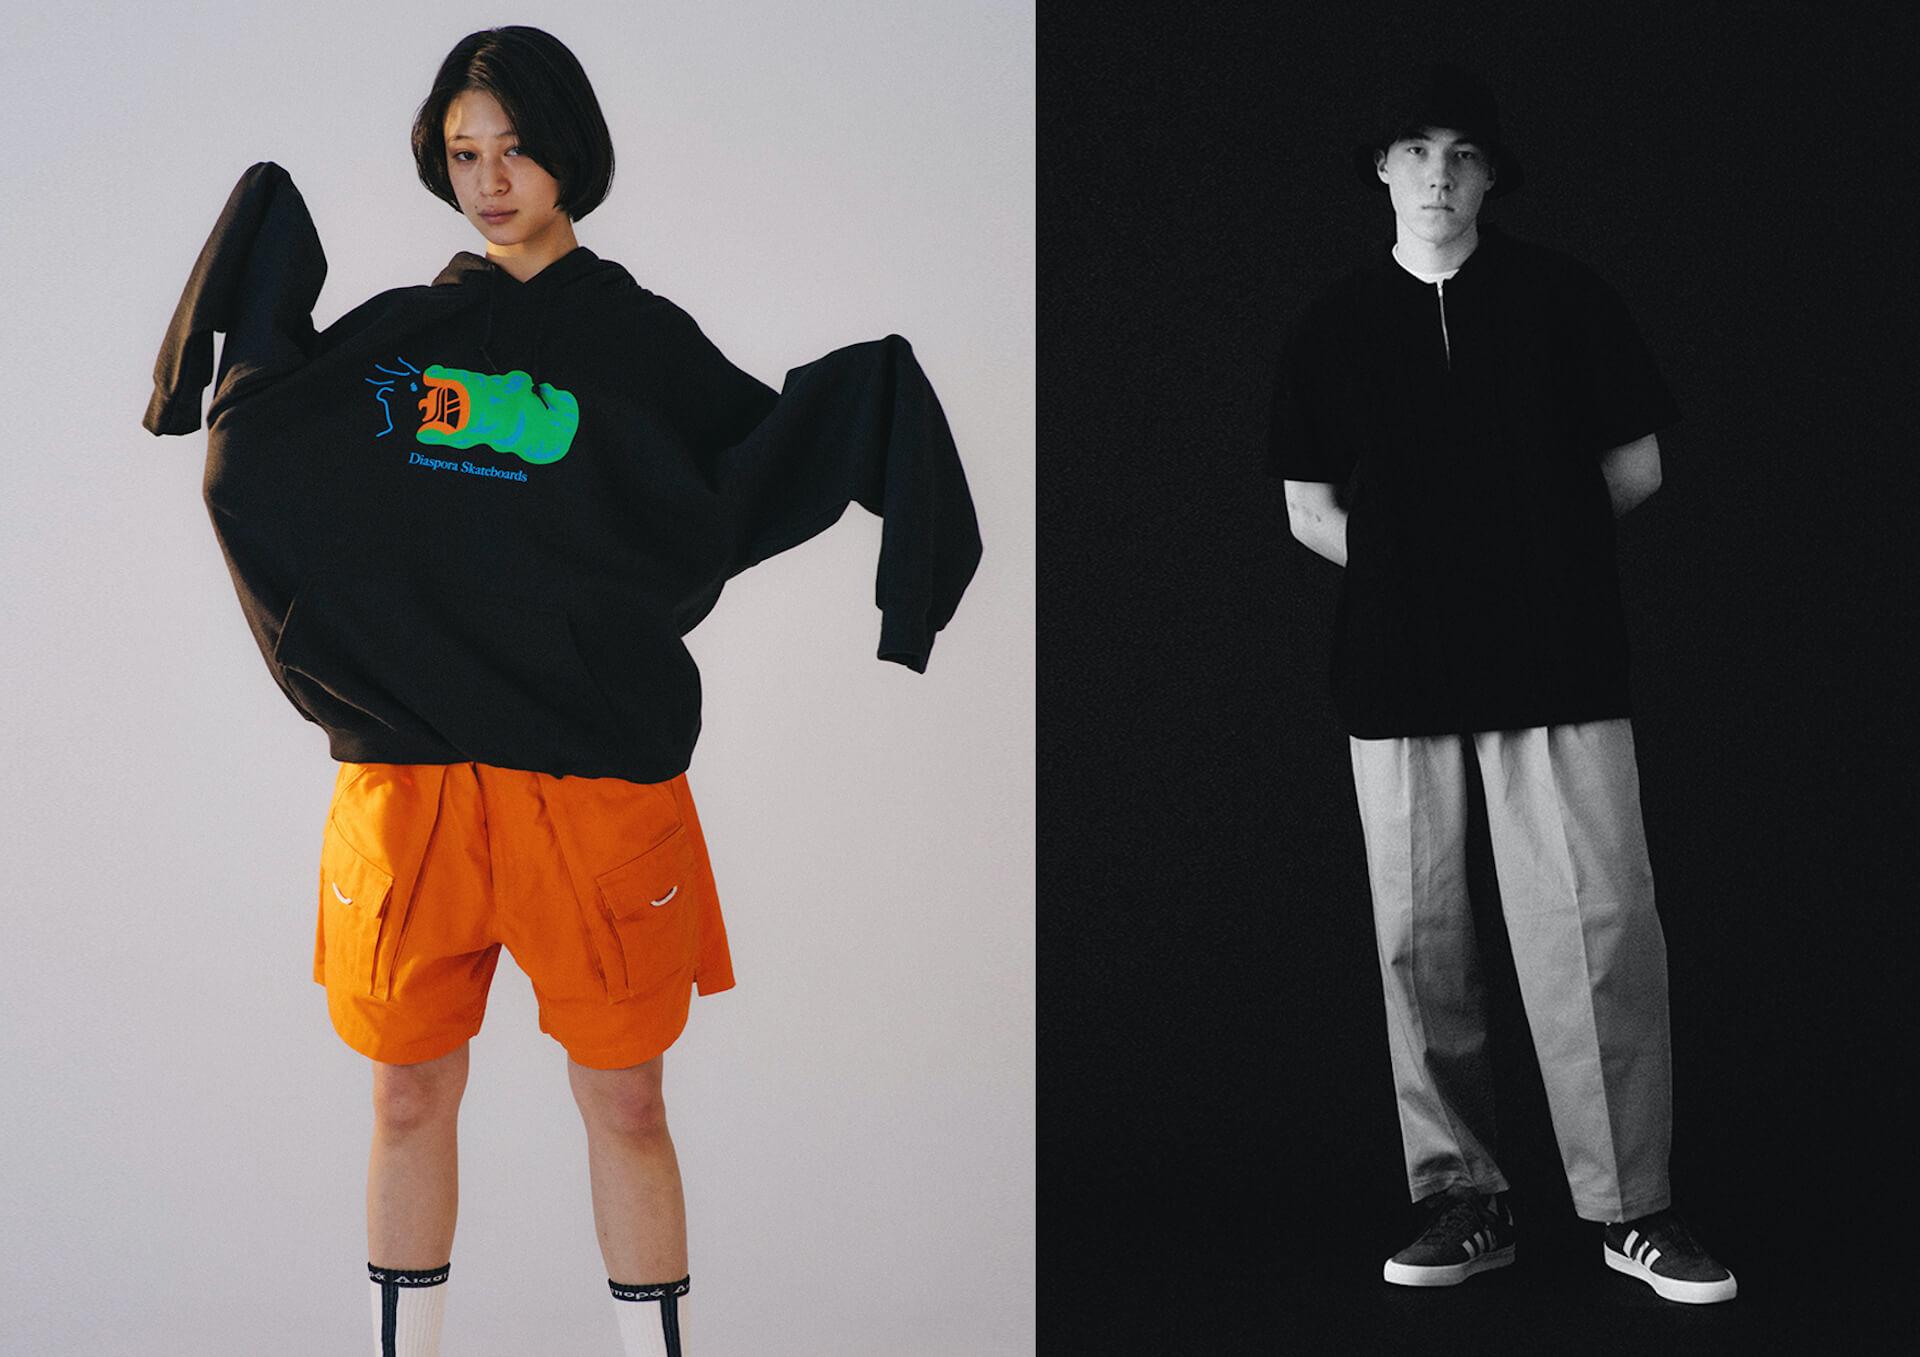 Diaspora skateboardsが2021SSのルックビジュアルを公開!モデルにはmiuらを起用 fashion210225_diasporaskateboards-09